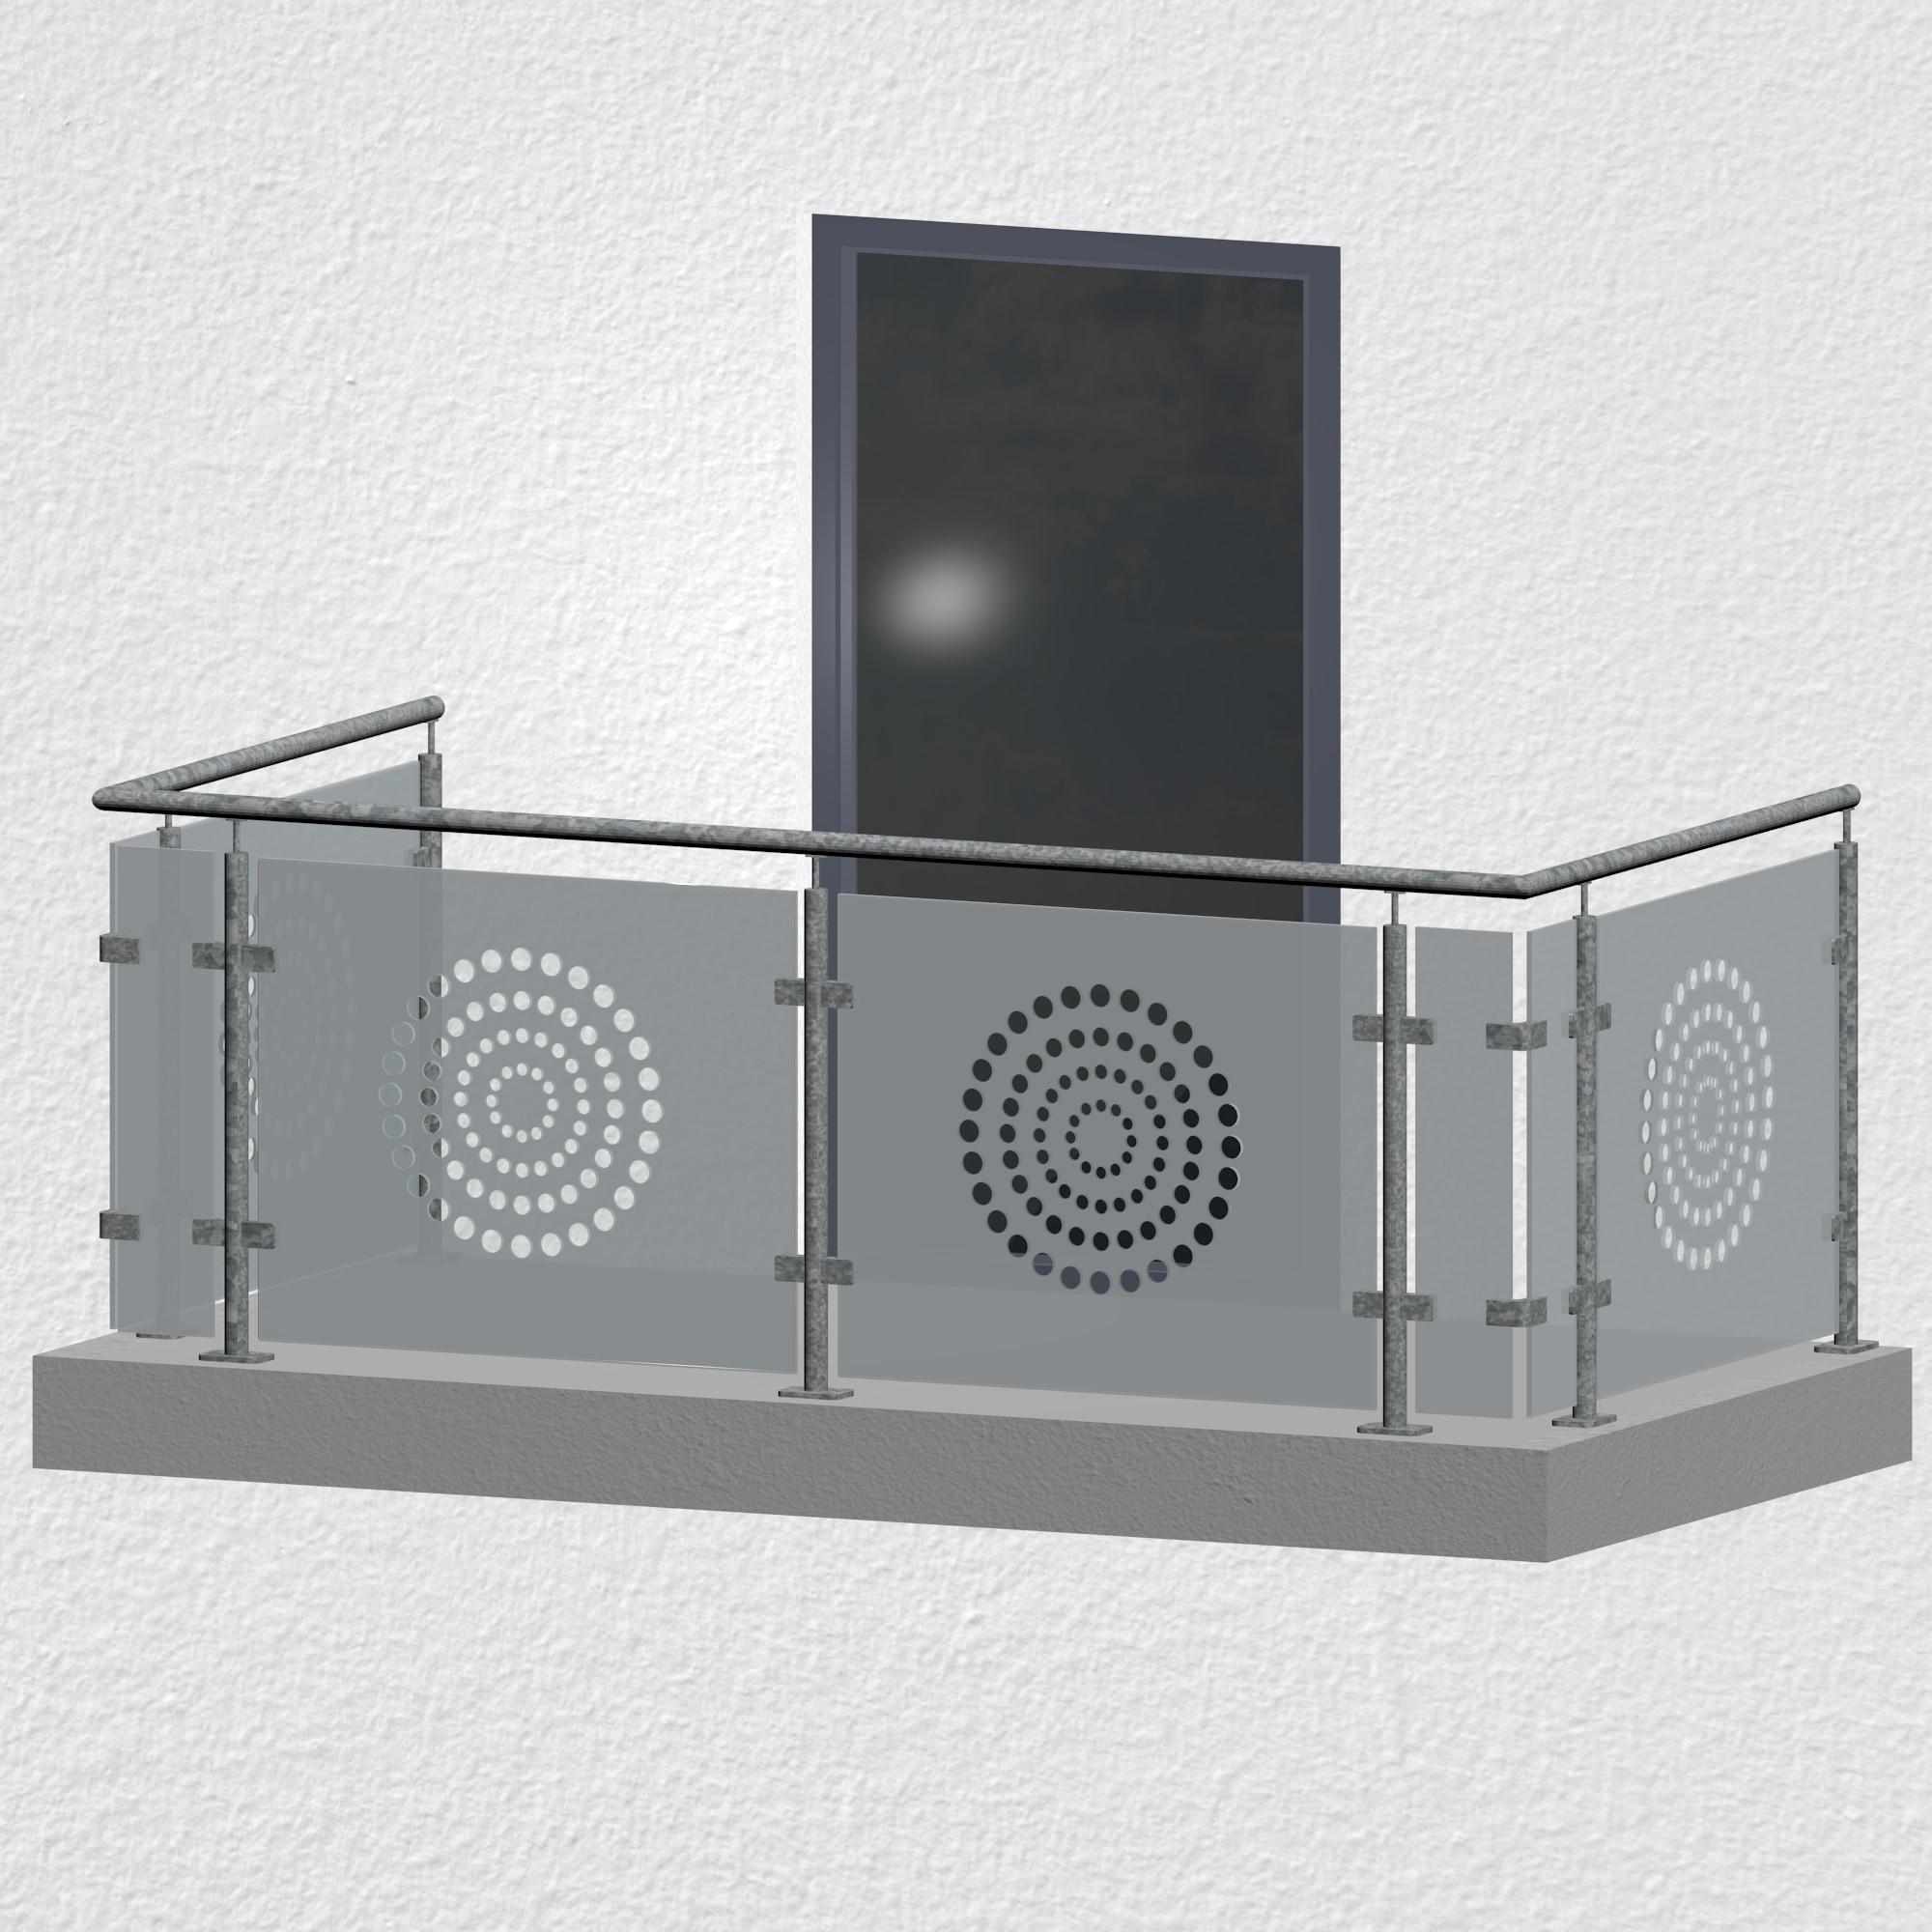 Balkongeländer verzinkt Designglas KR MO